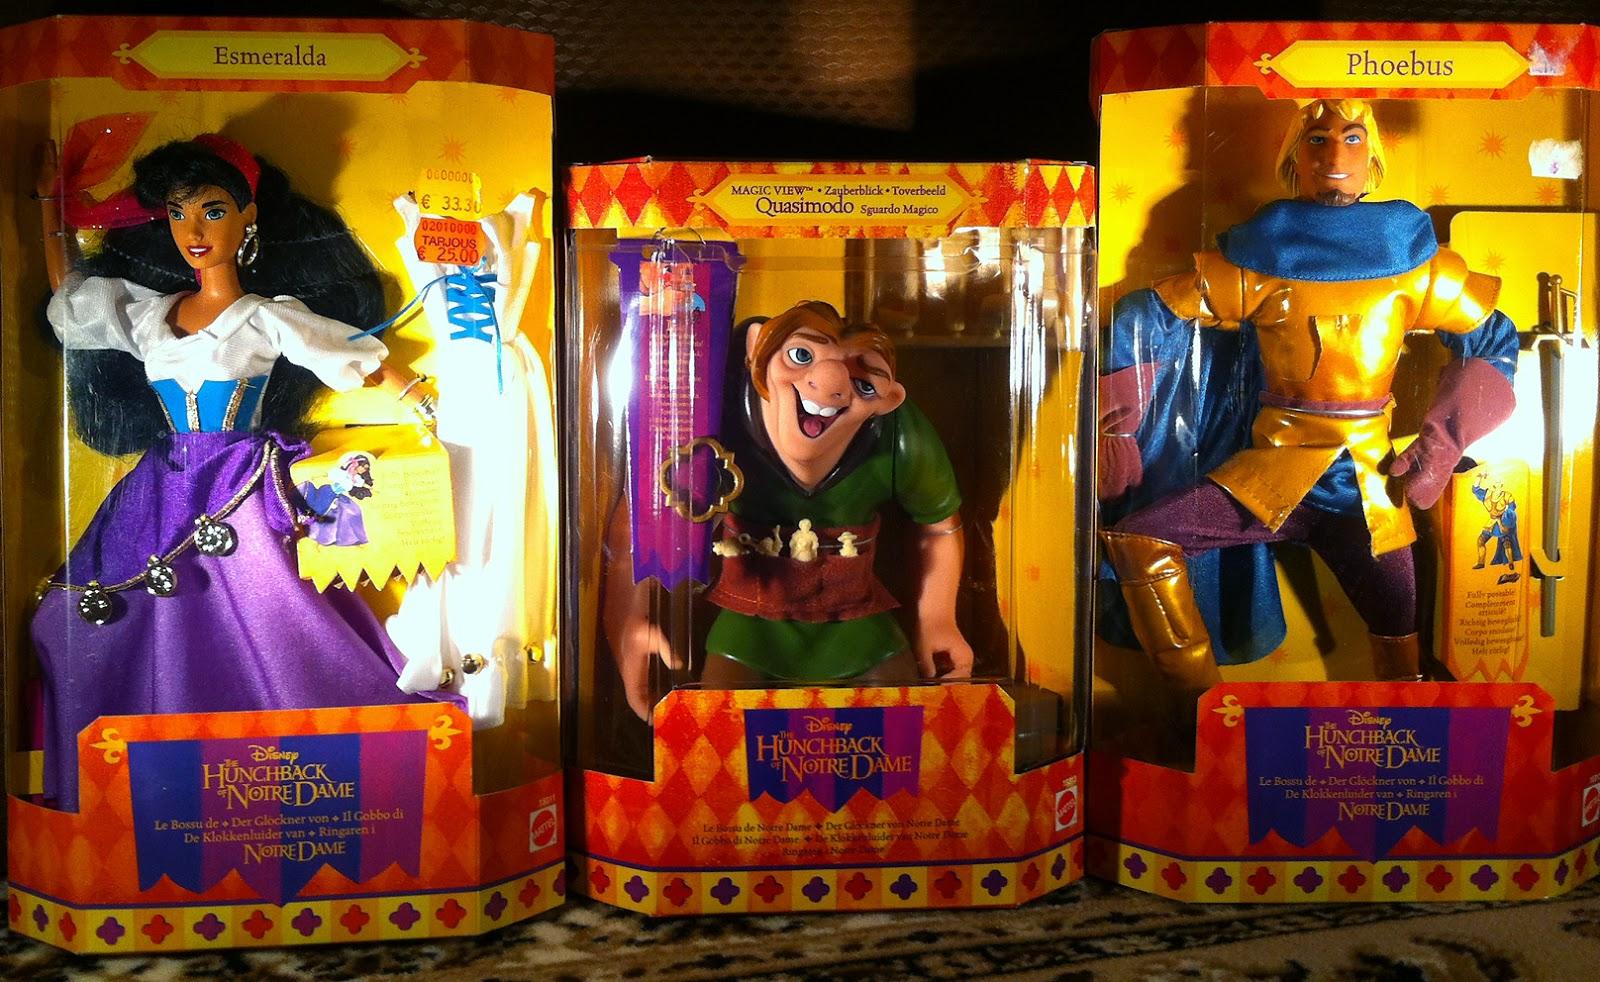 Disney-nuket NotreDame